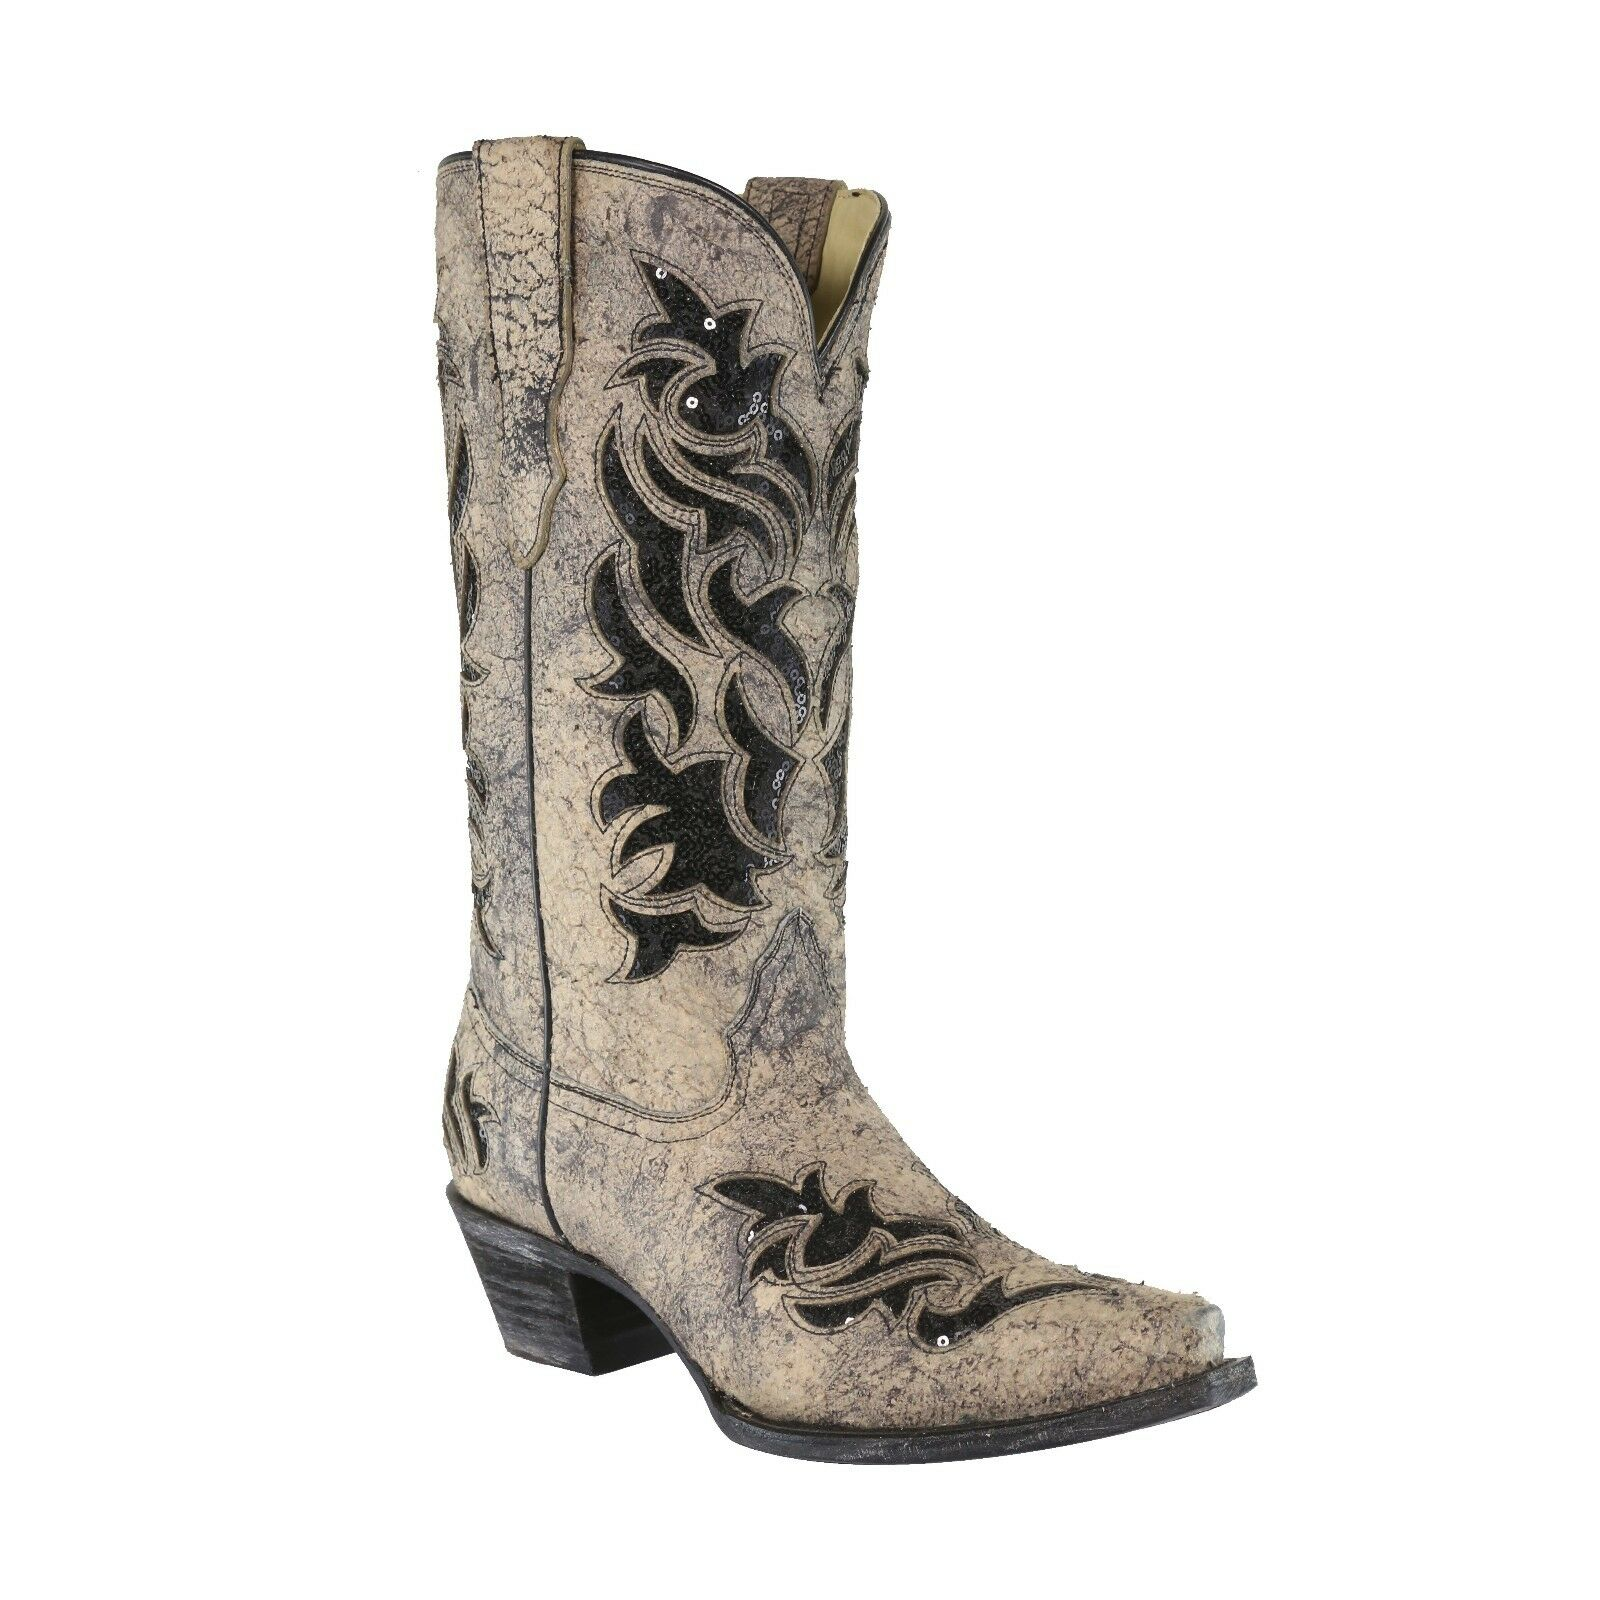 Corral Ladies Bone/Black Glitter Inlay Boot E1237